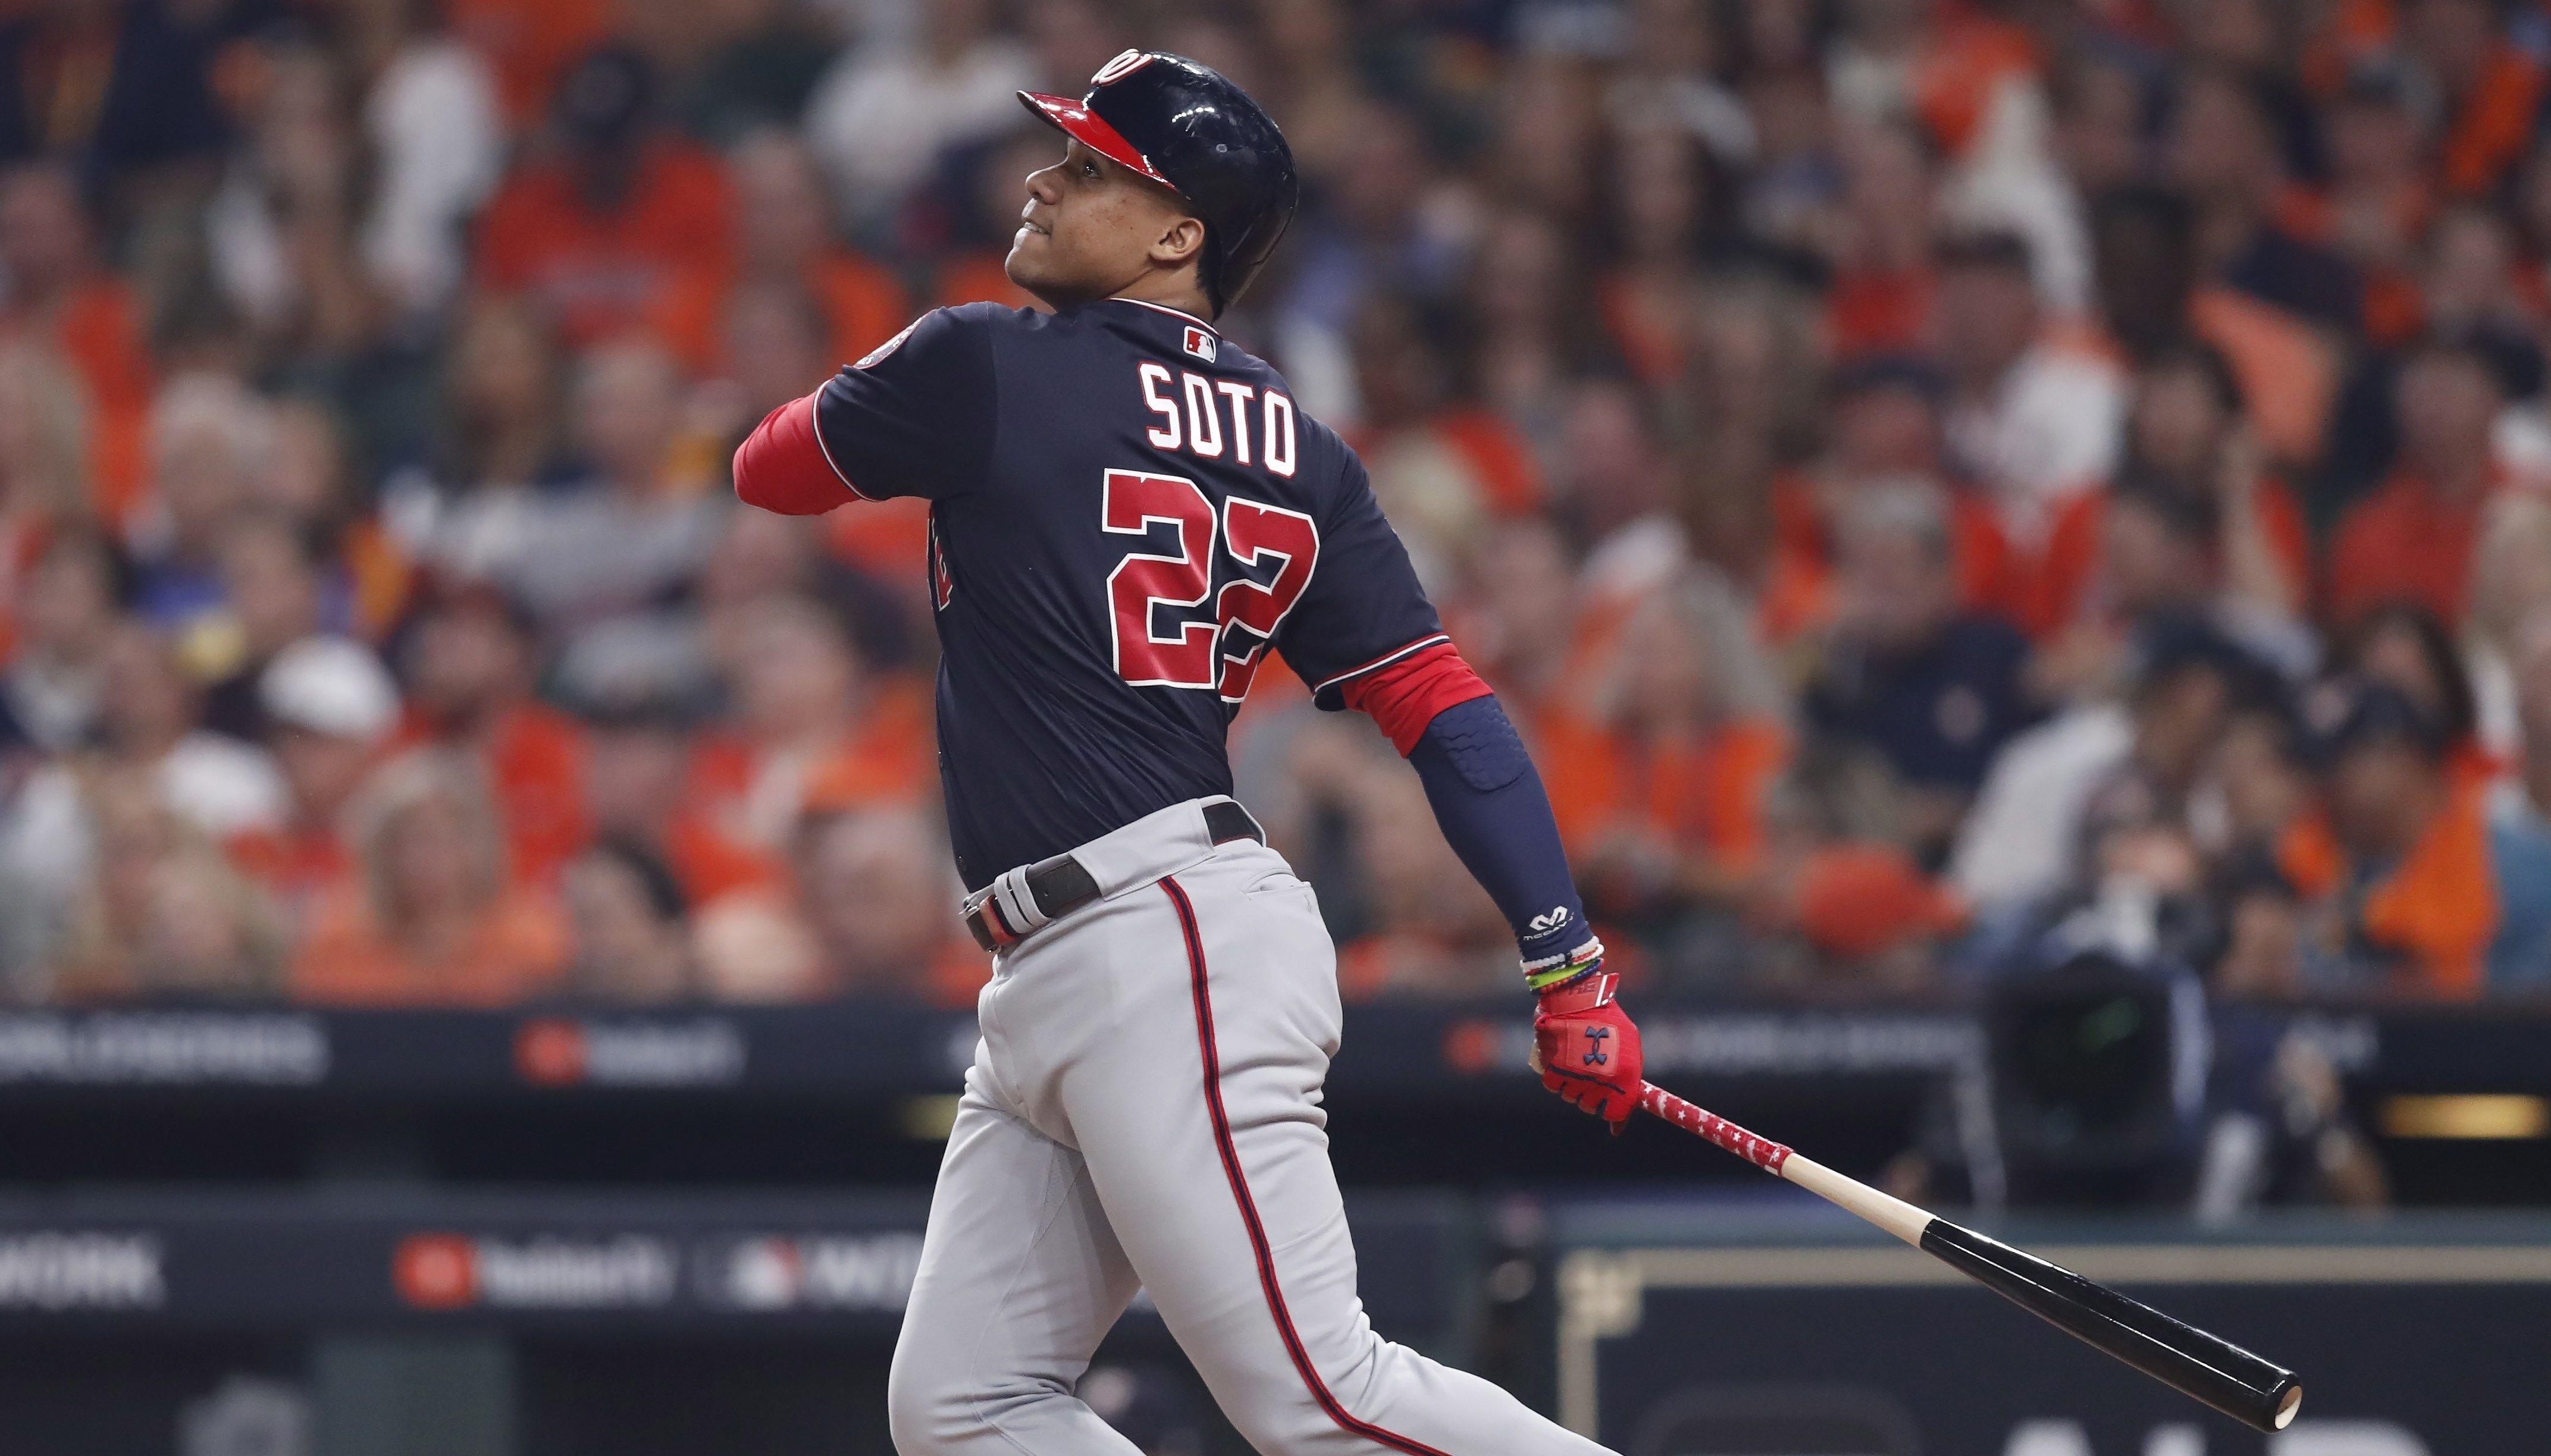 Soto decide con jonrón; Devers deja tendidos a Yankees